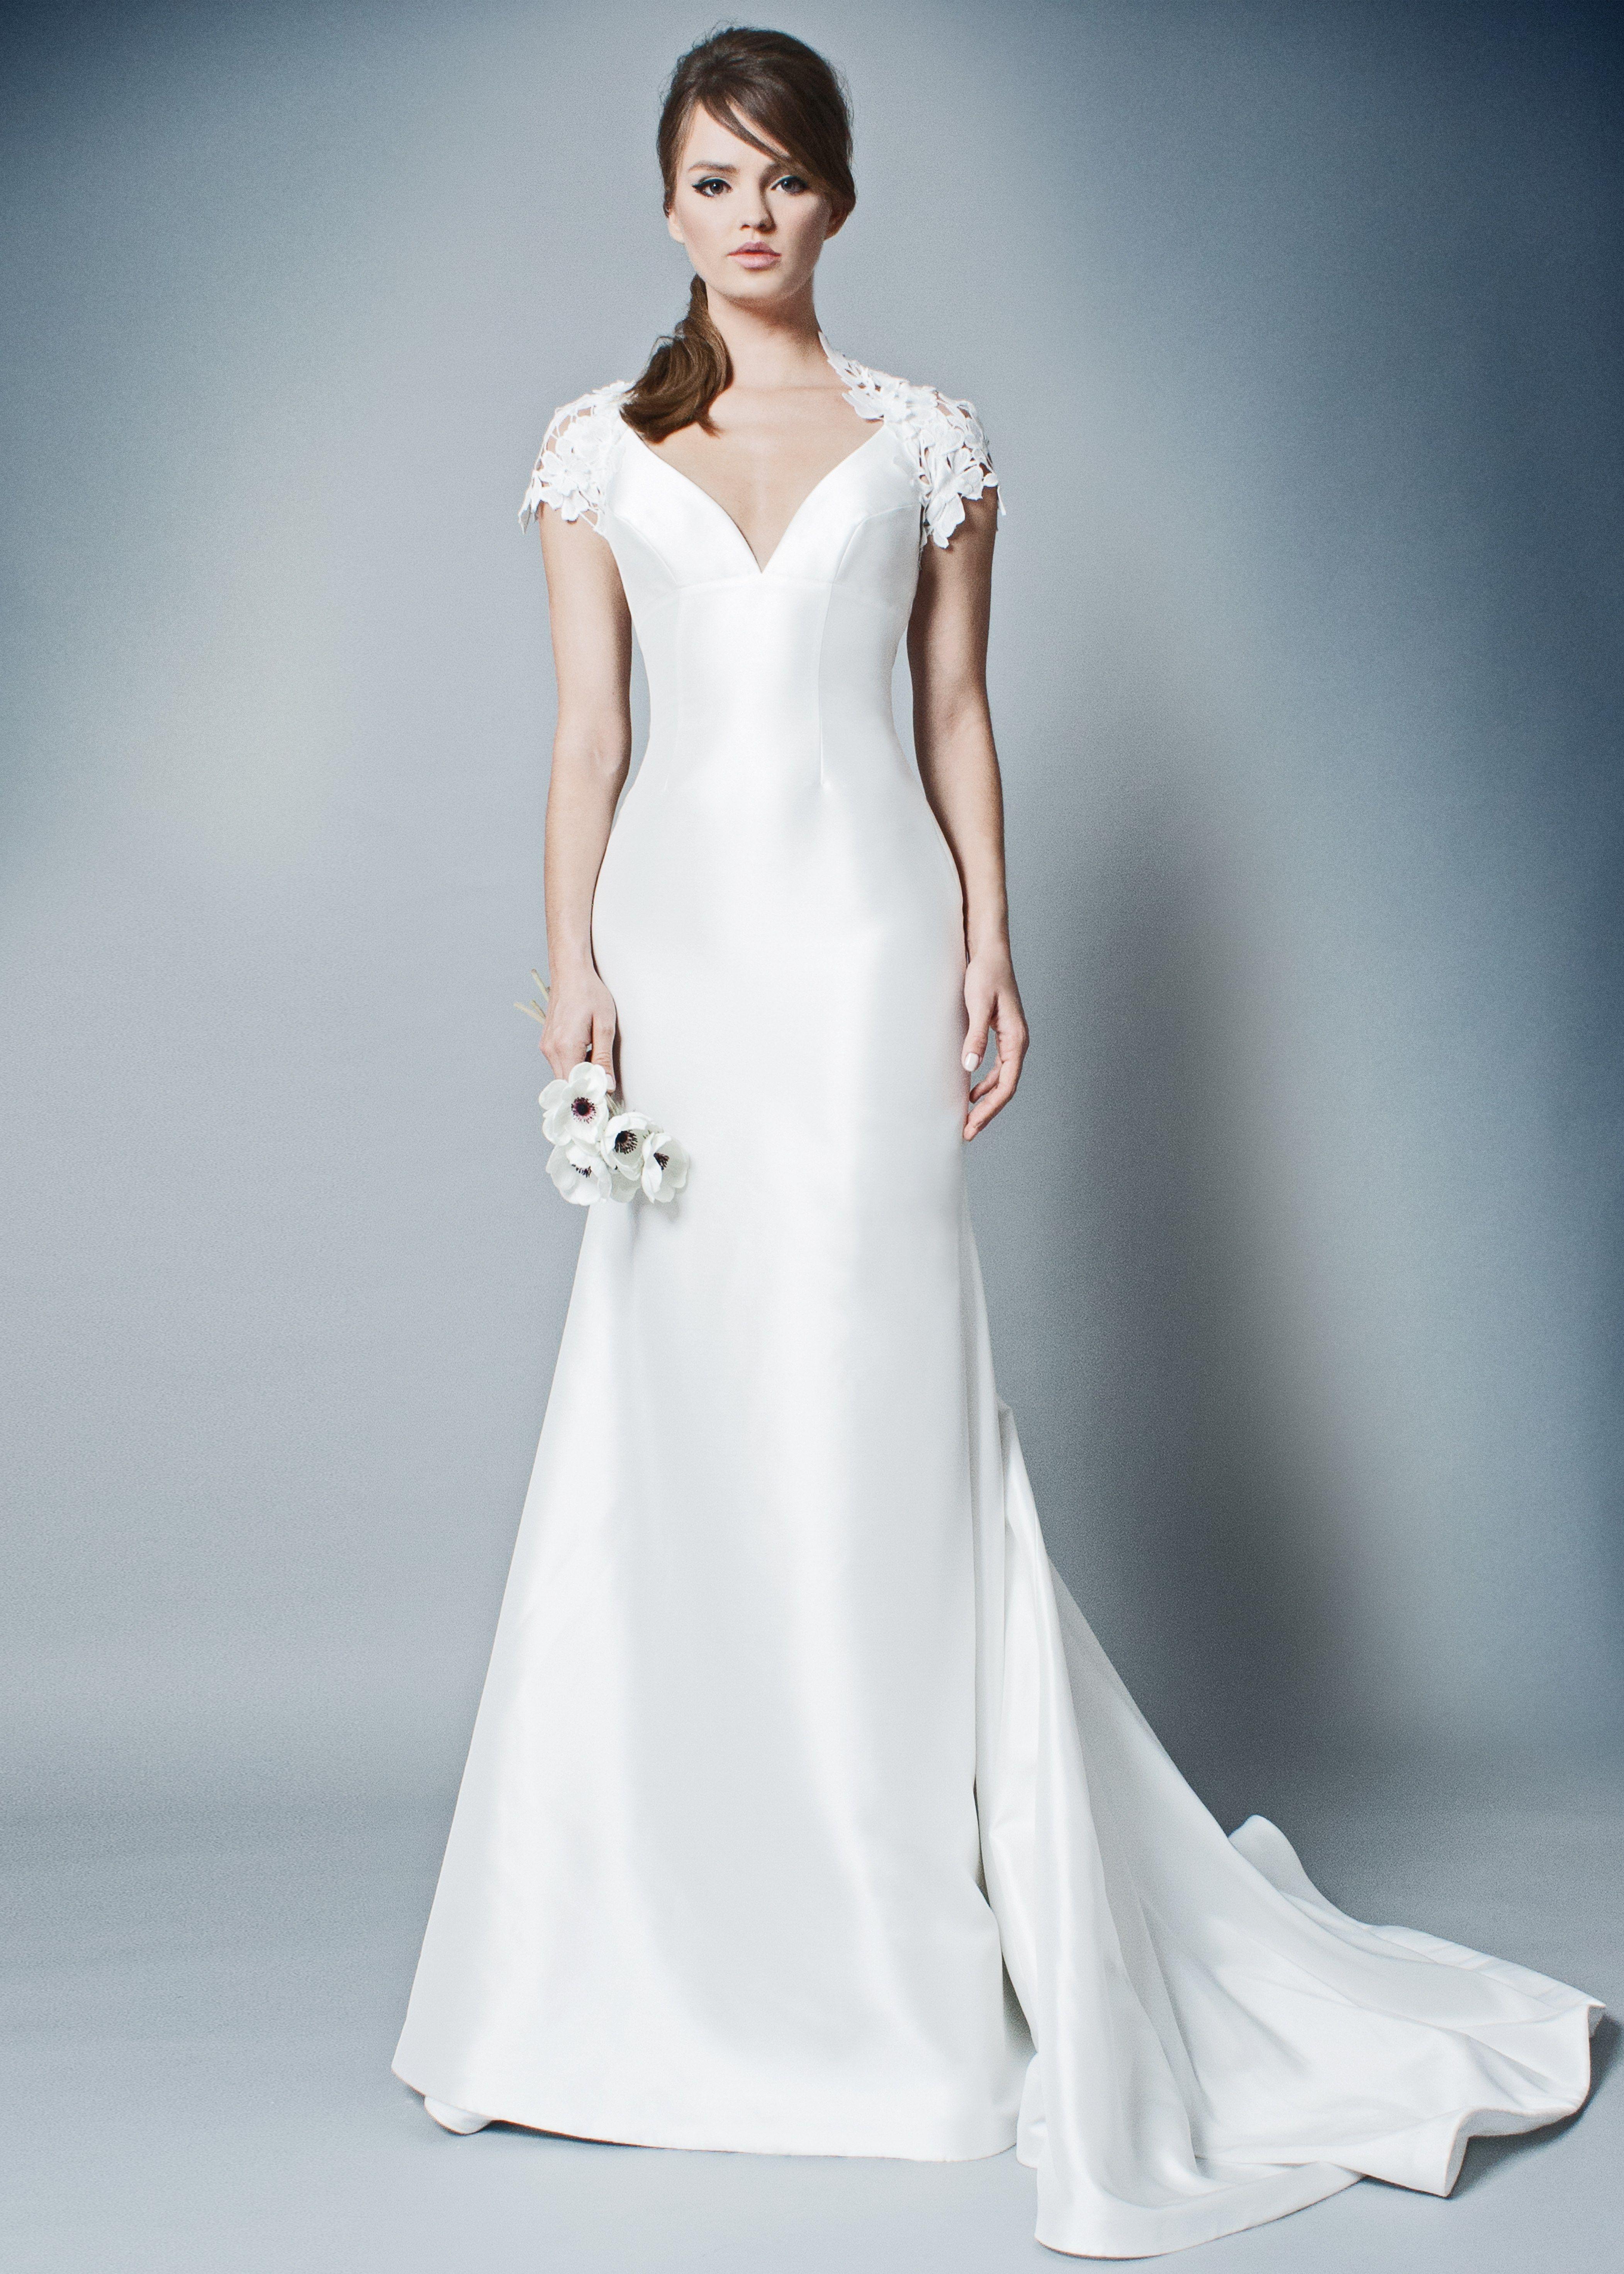 Fantastic Vestidos De Novia Madrid Pictures - All Wedding Dresses ...